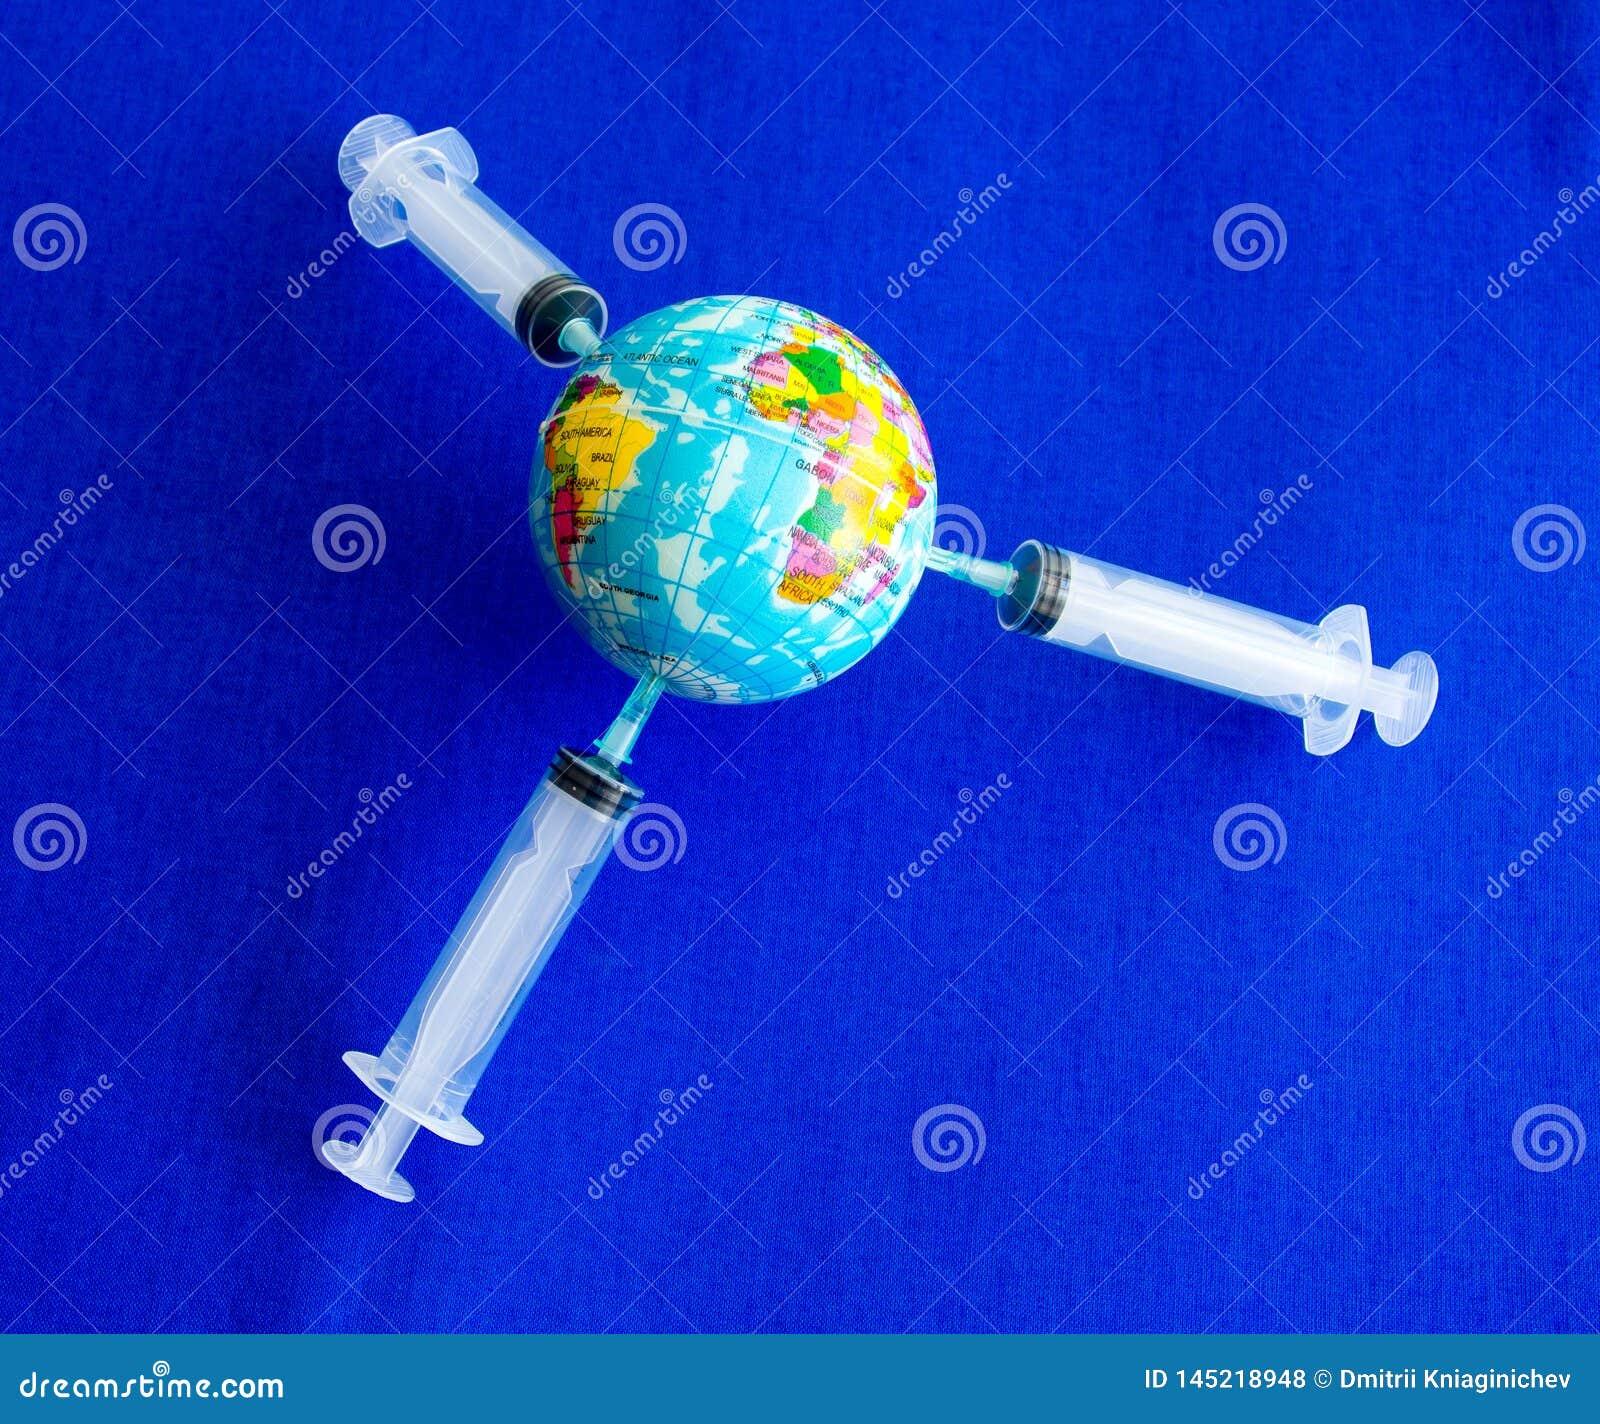 The model earth on the syringe on blue background- image